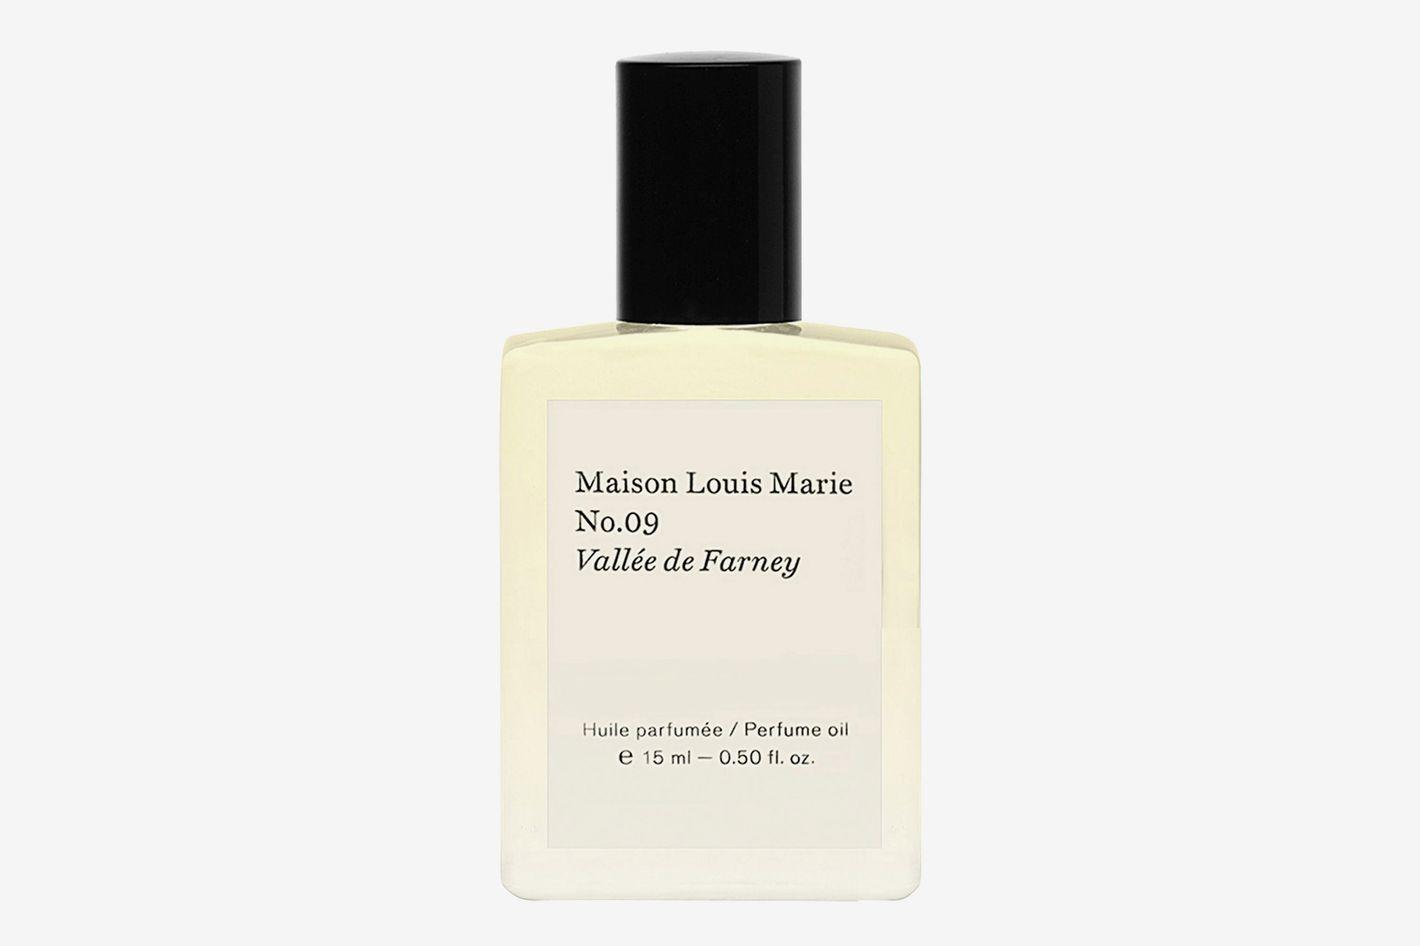 Maison Louis Marie No.09 Perfume Oil